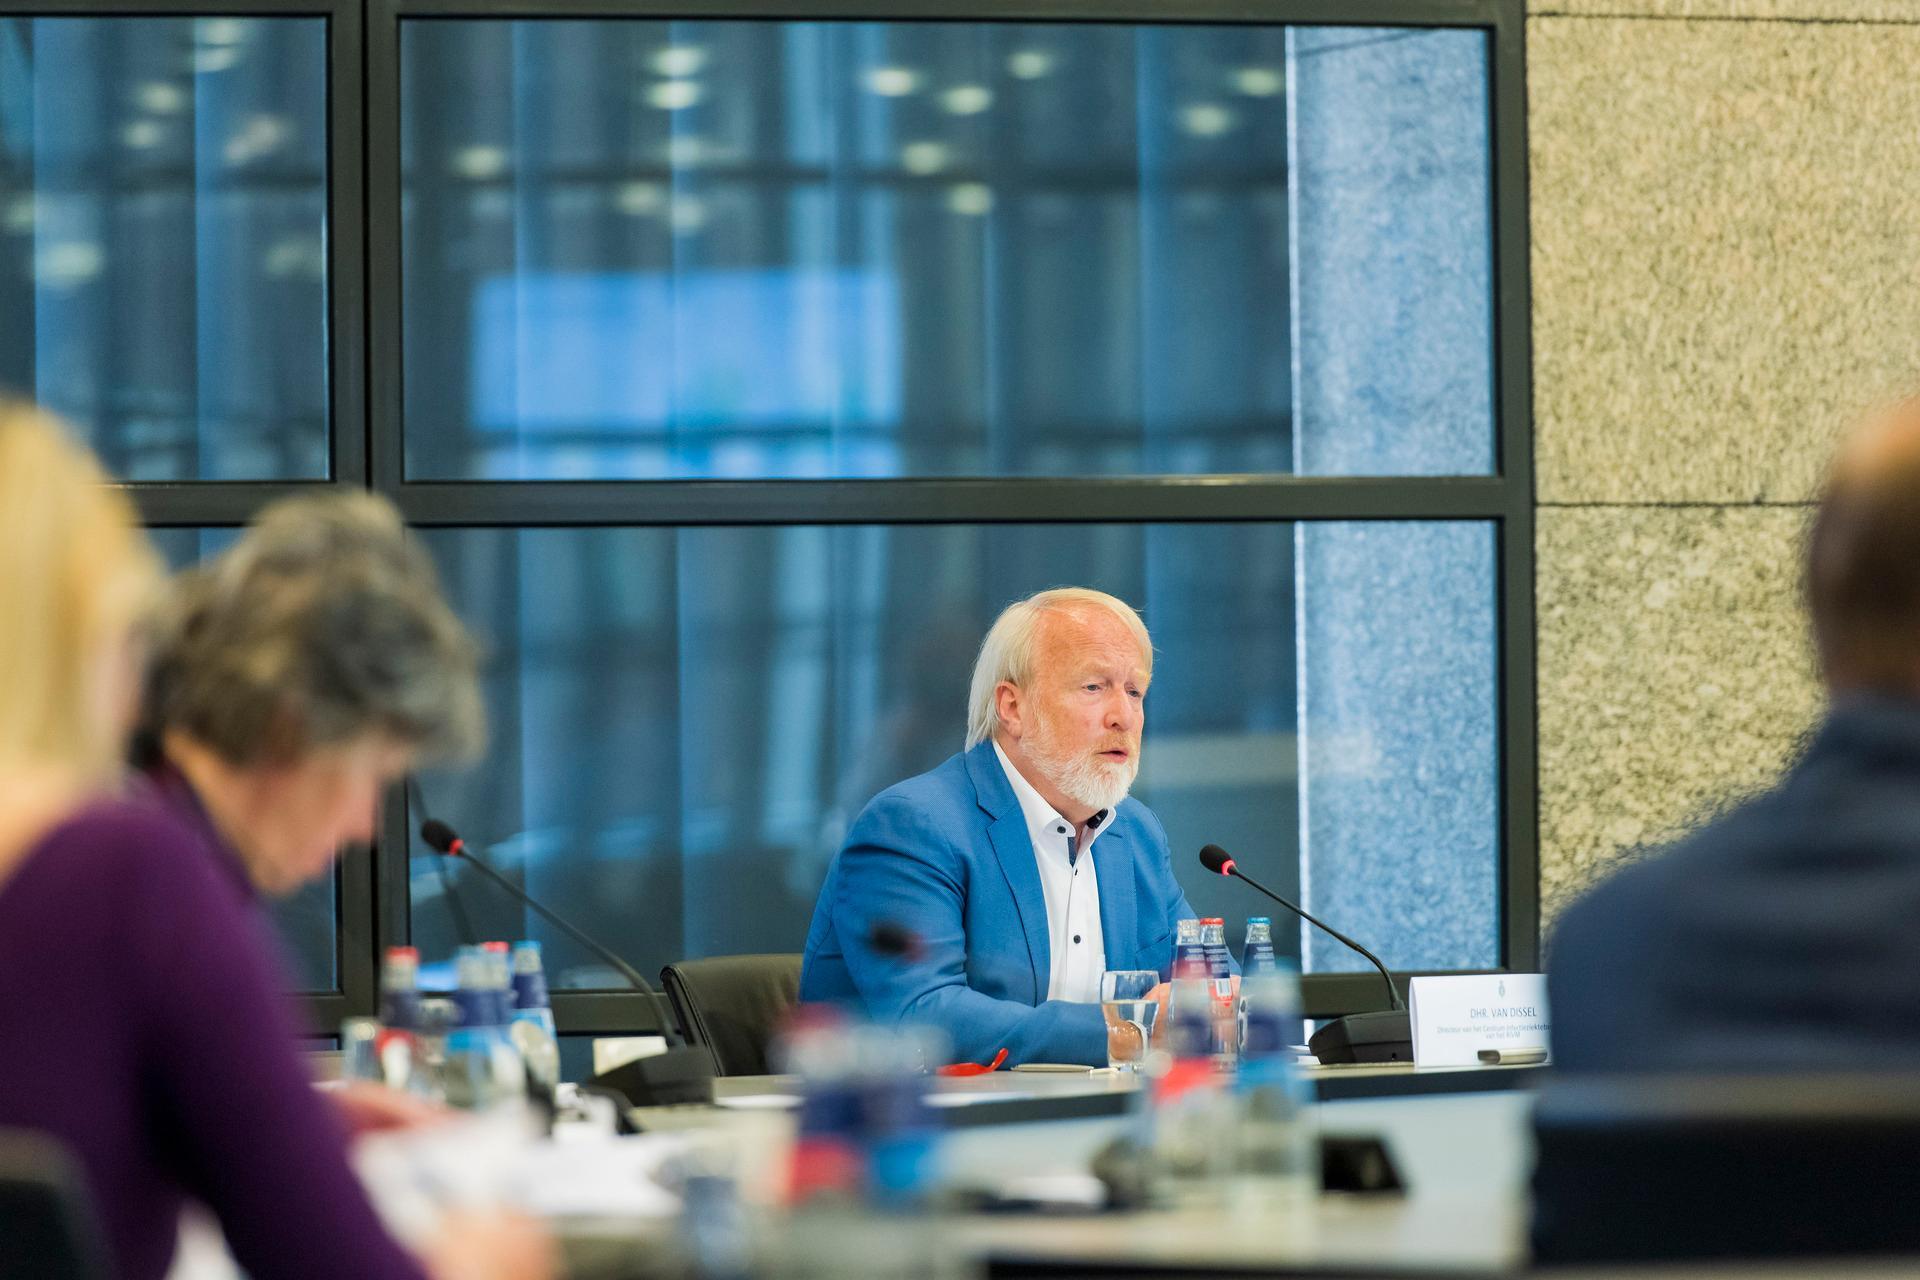 Jaap van Dissel at a technical briefing in the House of Representatives (Tweede kamer in Dutch)